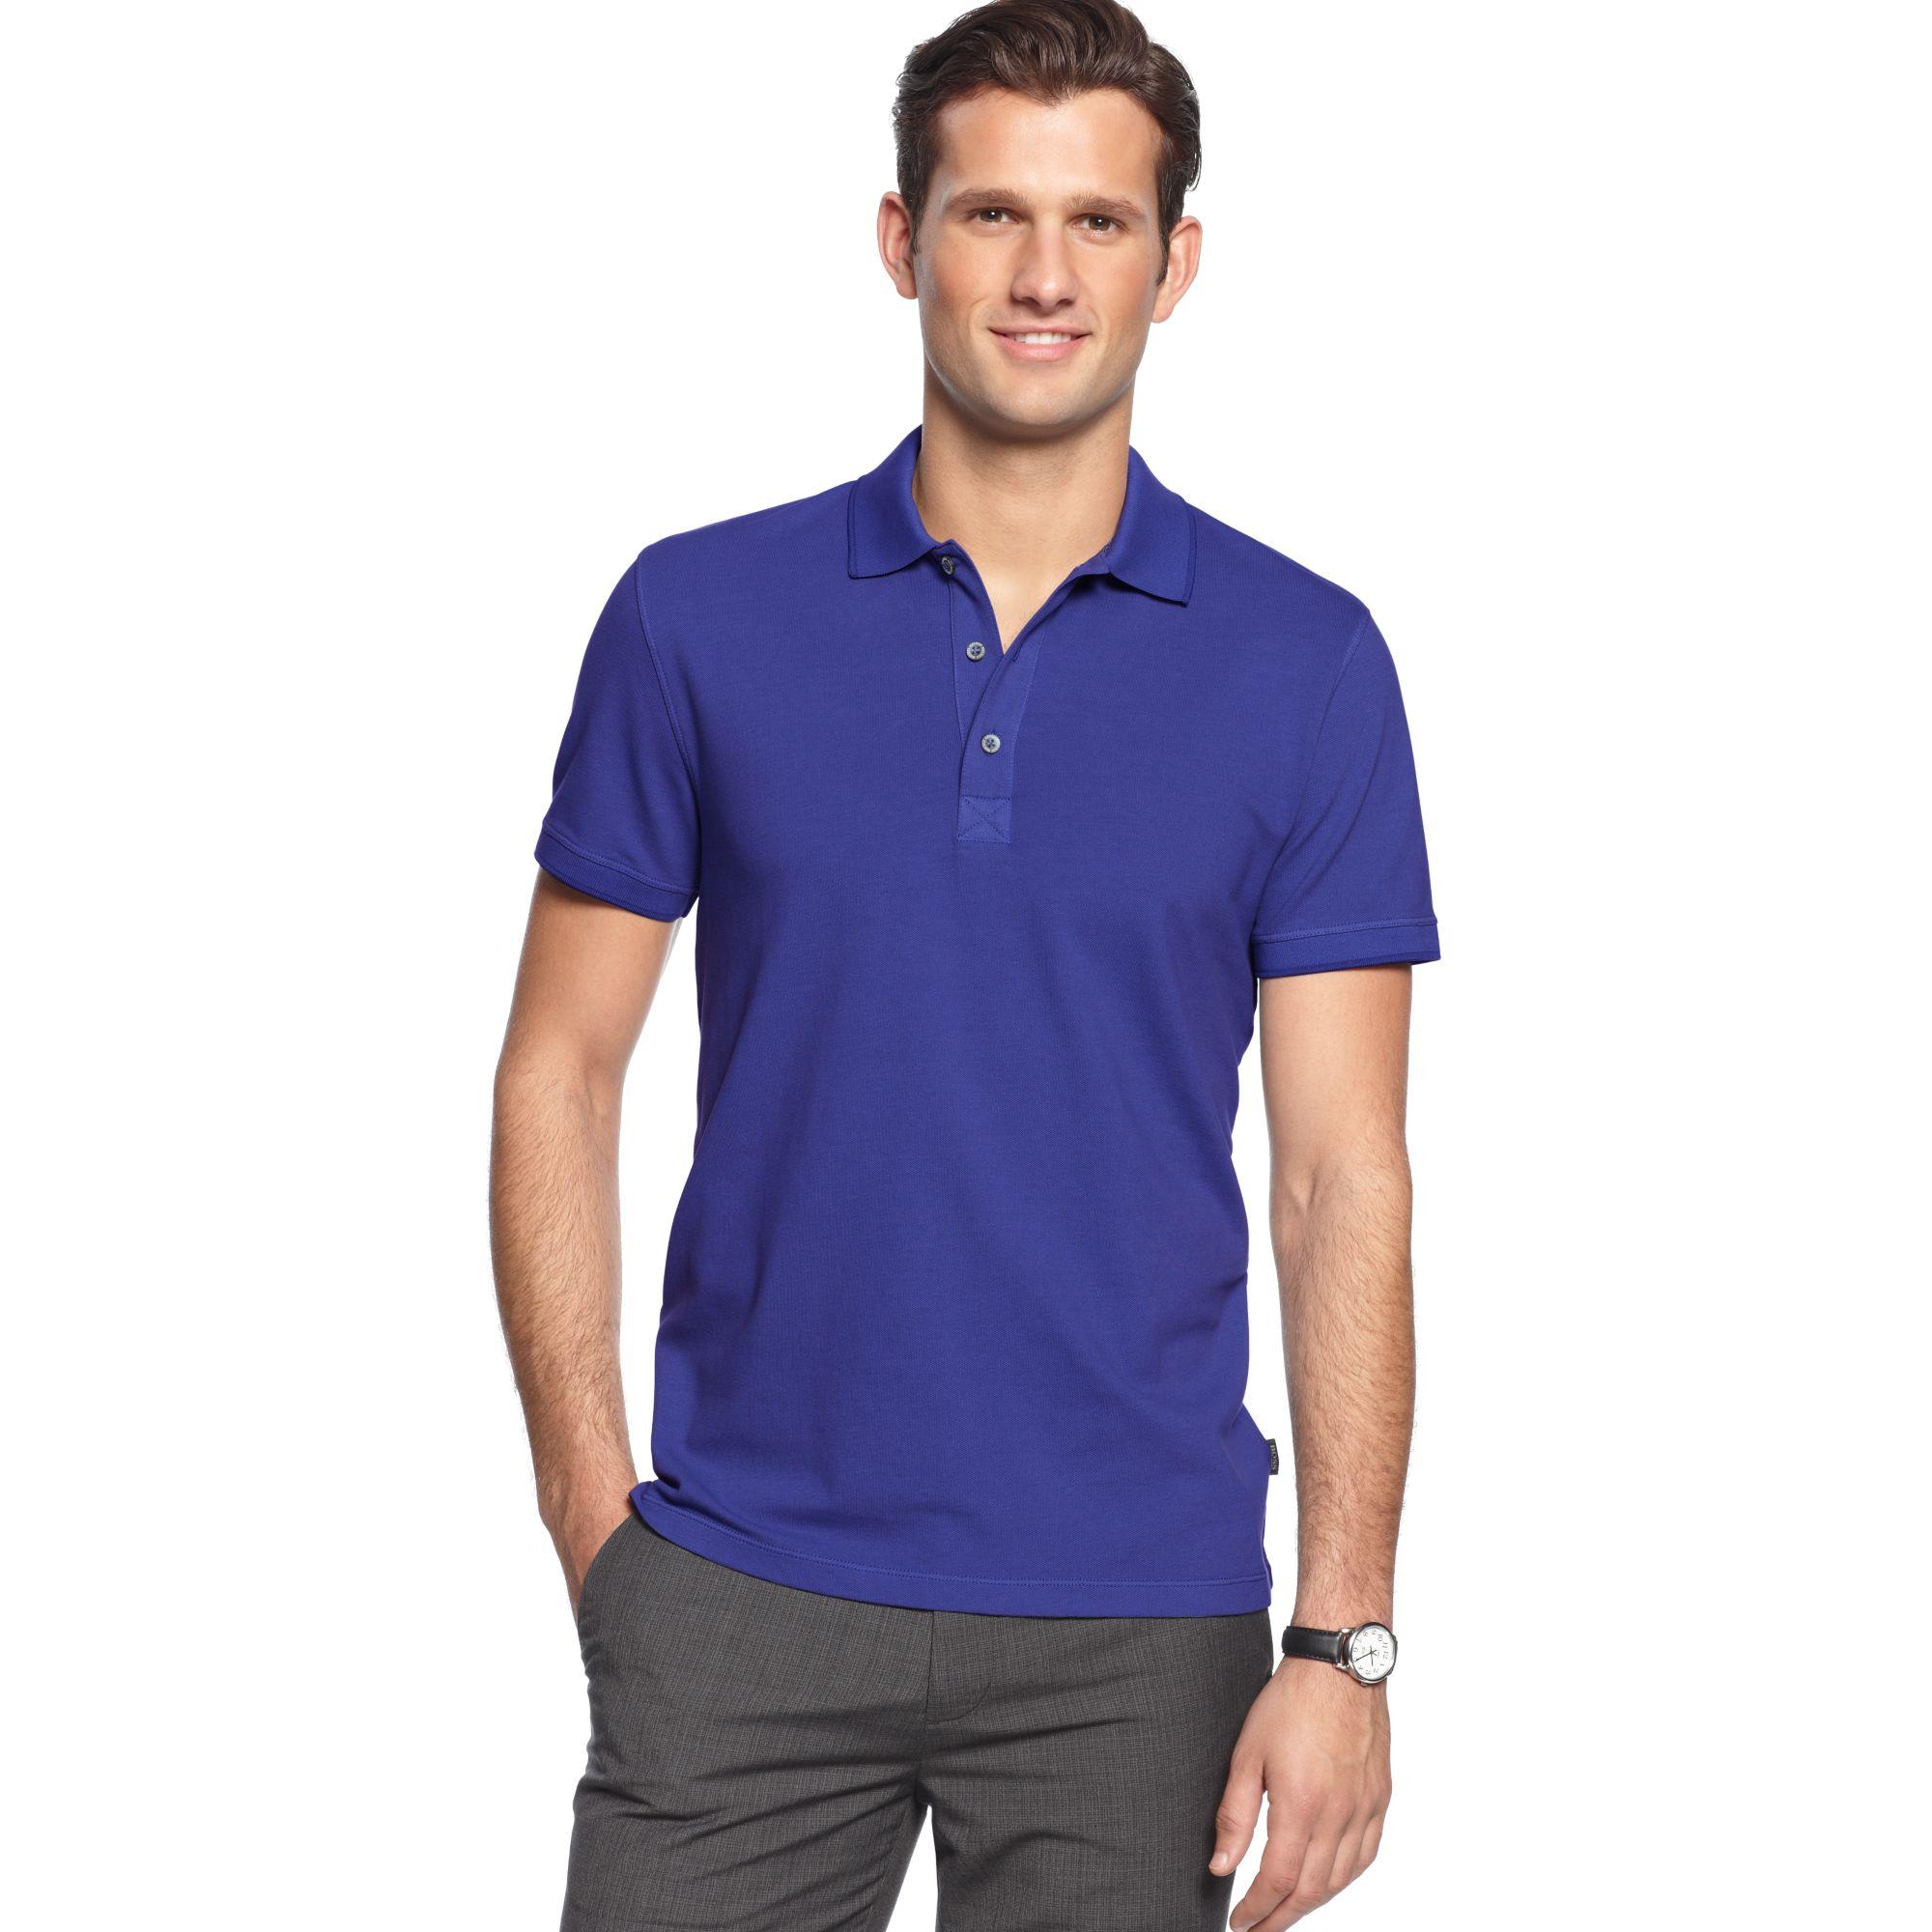 hugo boss boss black shirt forli slim fit polo shirt in blue for men. Black Bedroom Furniture Sets. Home Design Ideas